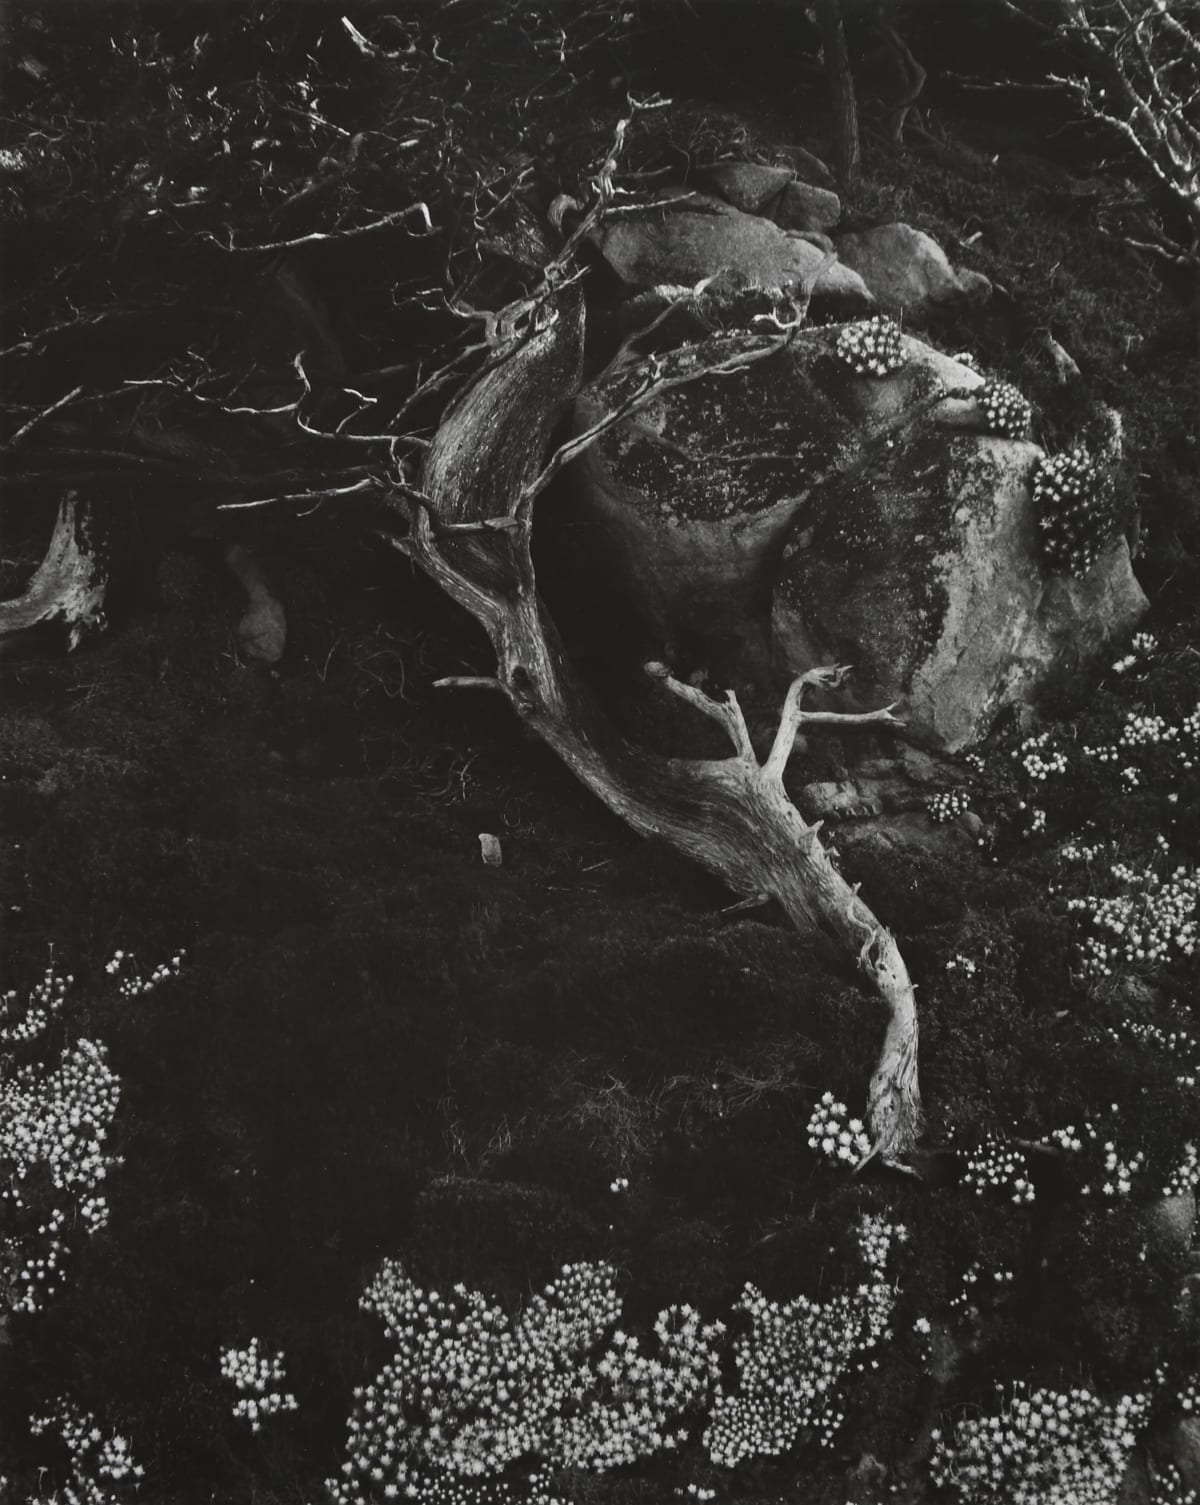 Edward Weston, Cypress, Rock, Stone Crop, 1930